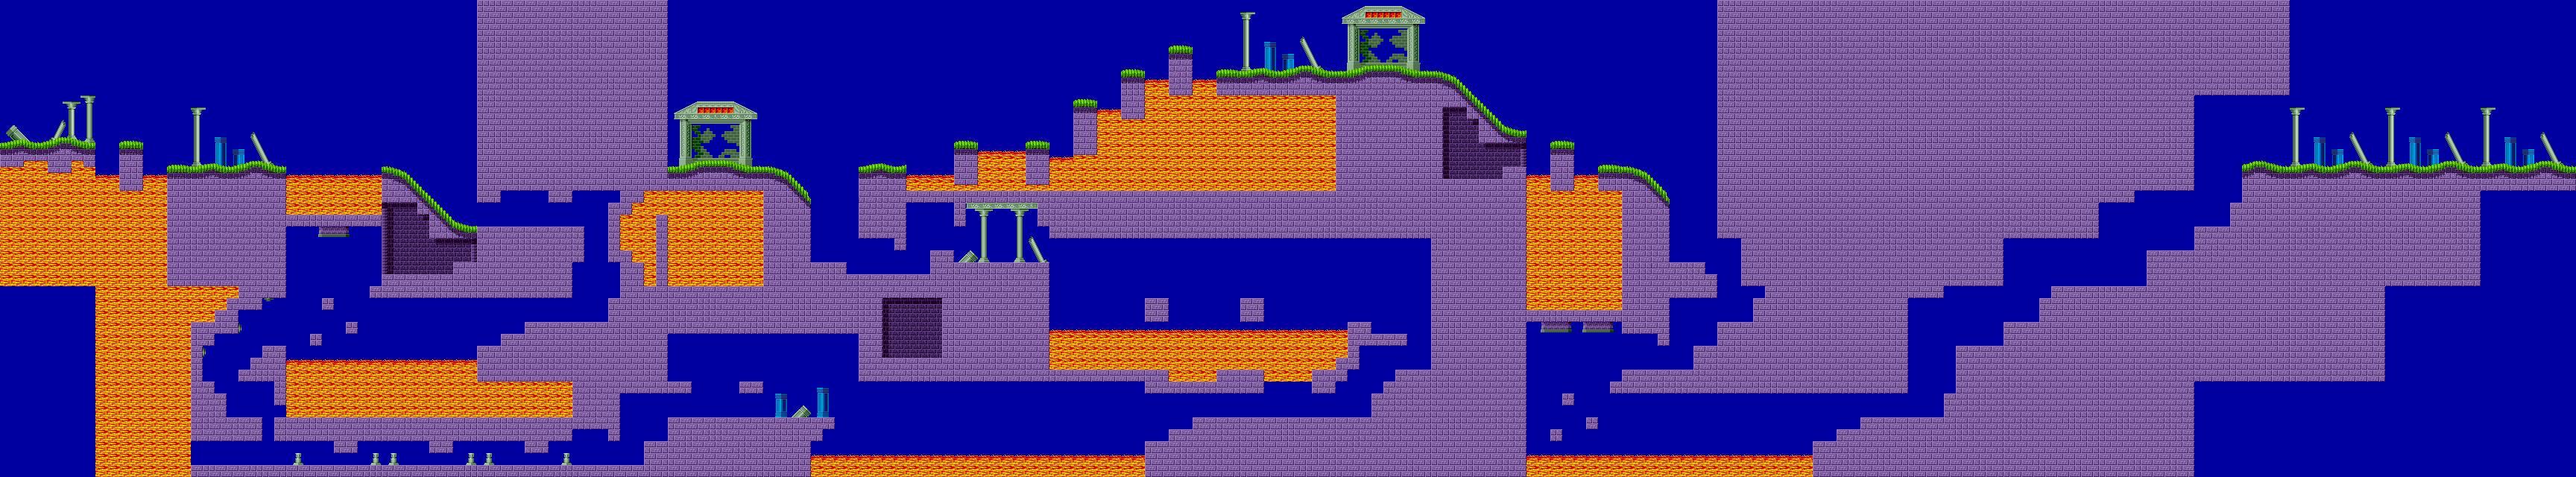 3 Sonic The Hedgehog Arcade Playthrough 1 Chaos Emeralds